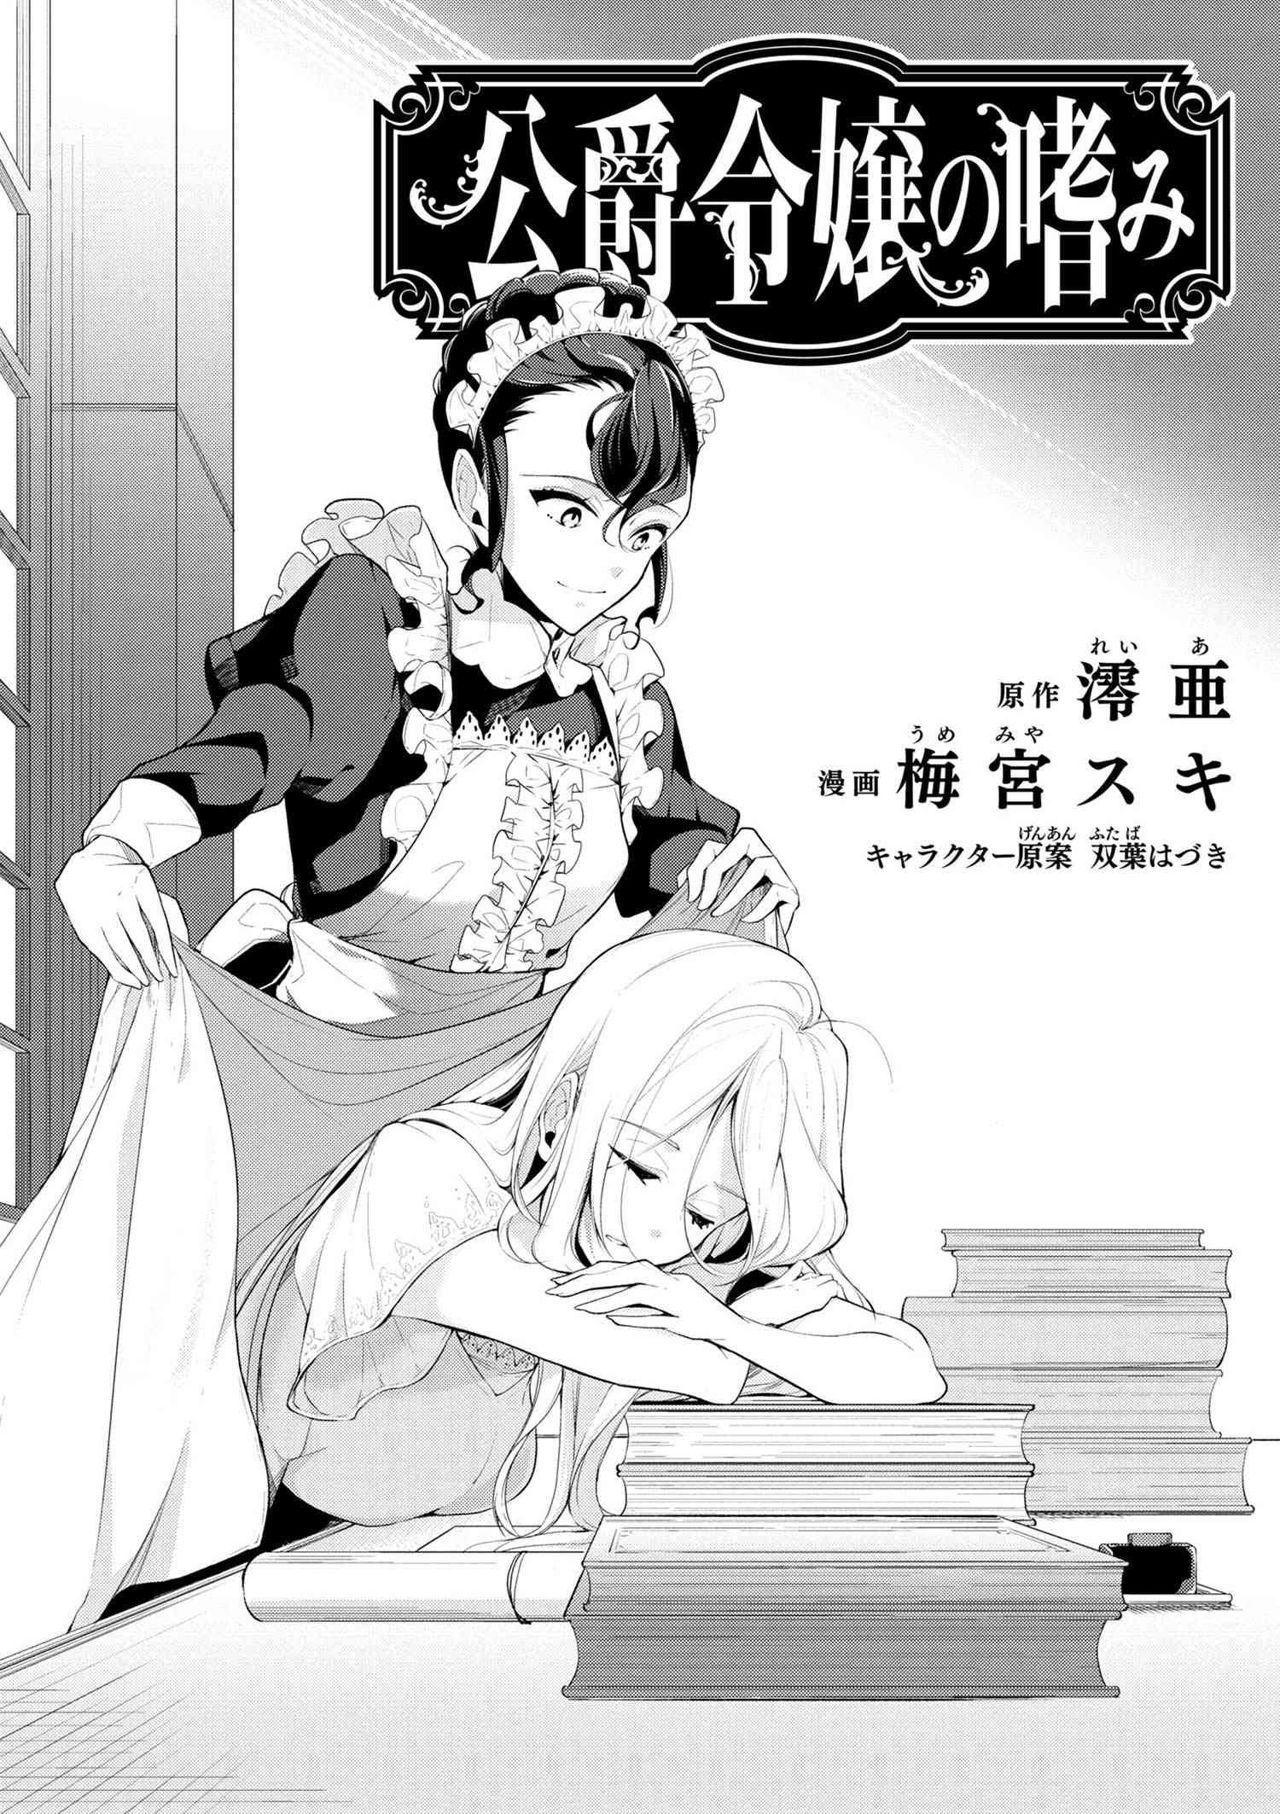 koushaku reijou no tashinami Capítulo 21.00 TALES OF